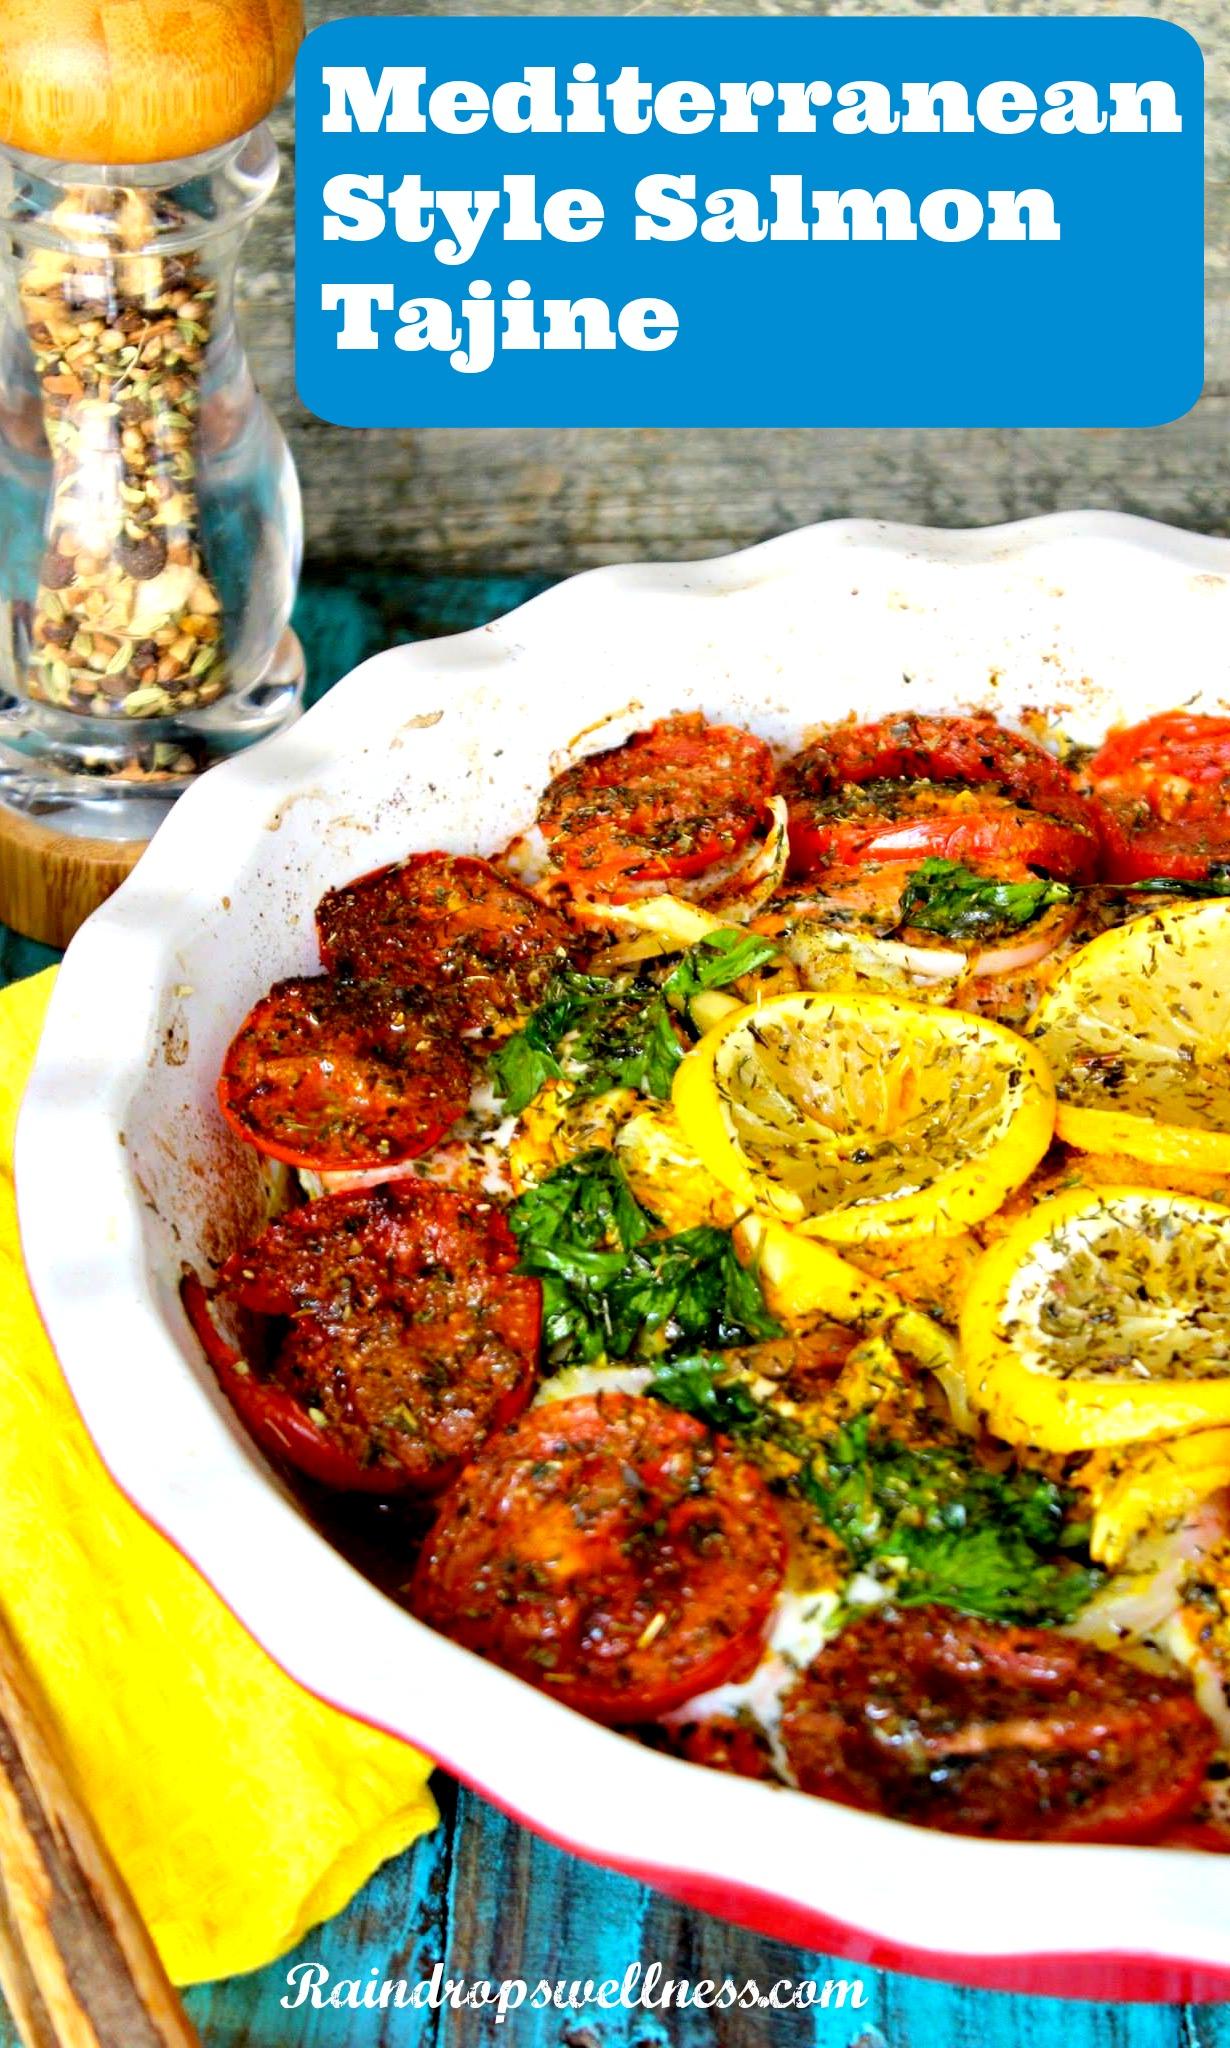 Mediterranean style salmon recipe raindrops wellness mediterranean style salmon recipe forumfinder Image collections